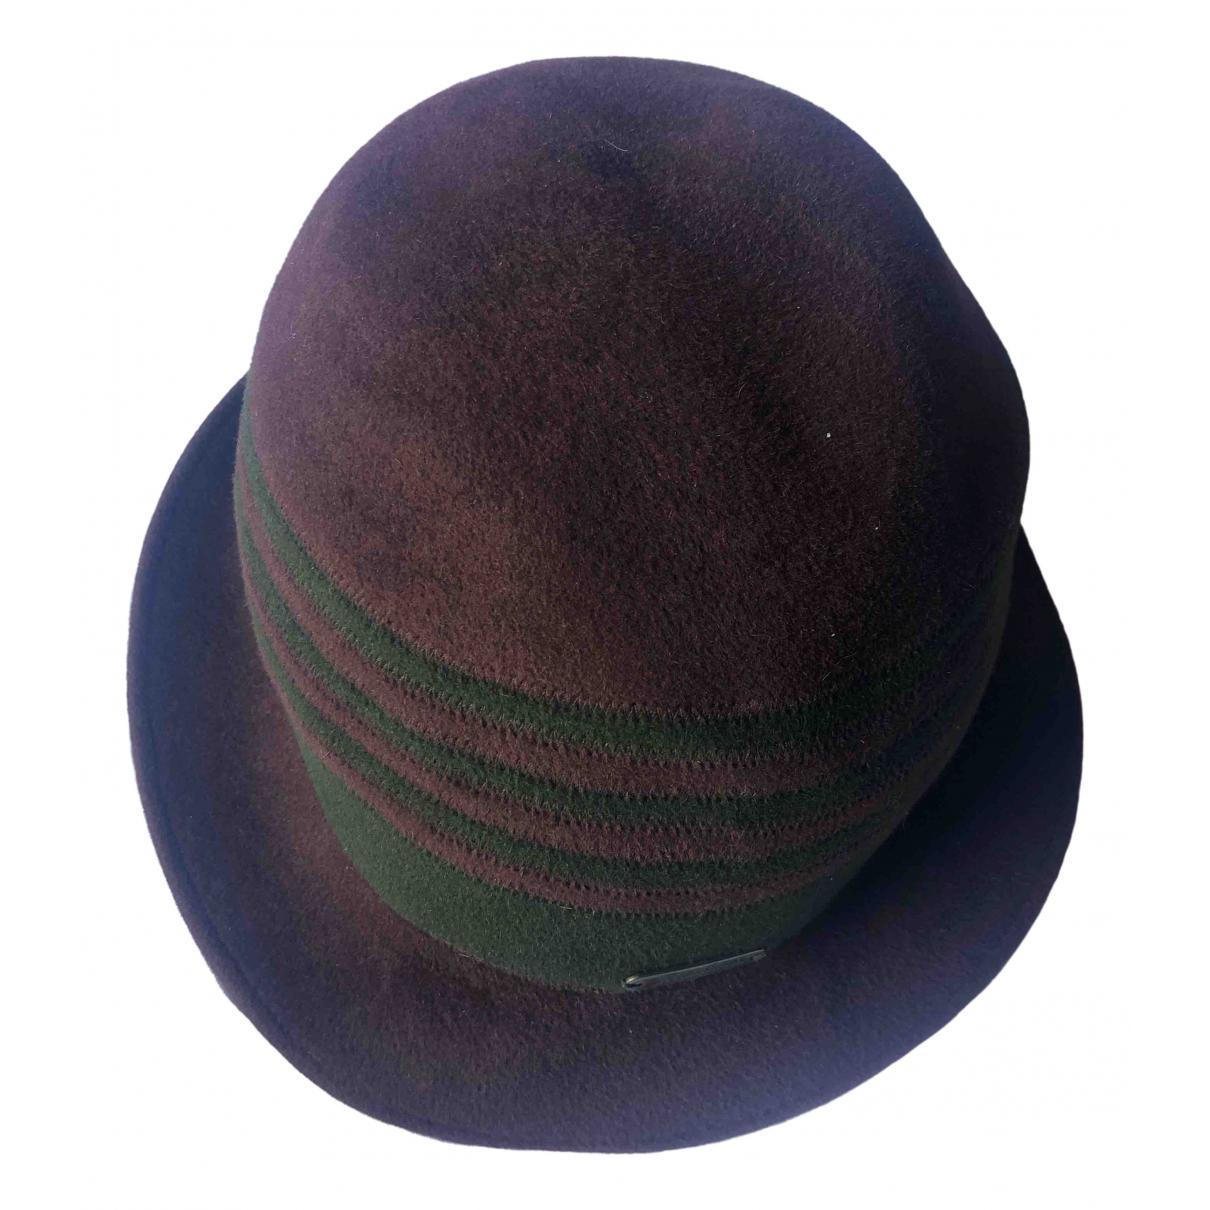 Sombrero de Lana Borsalino